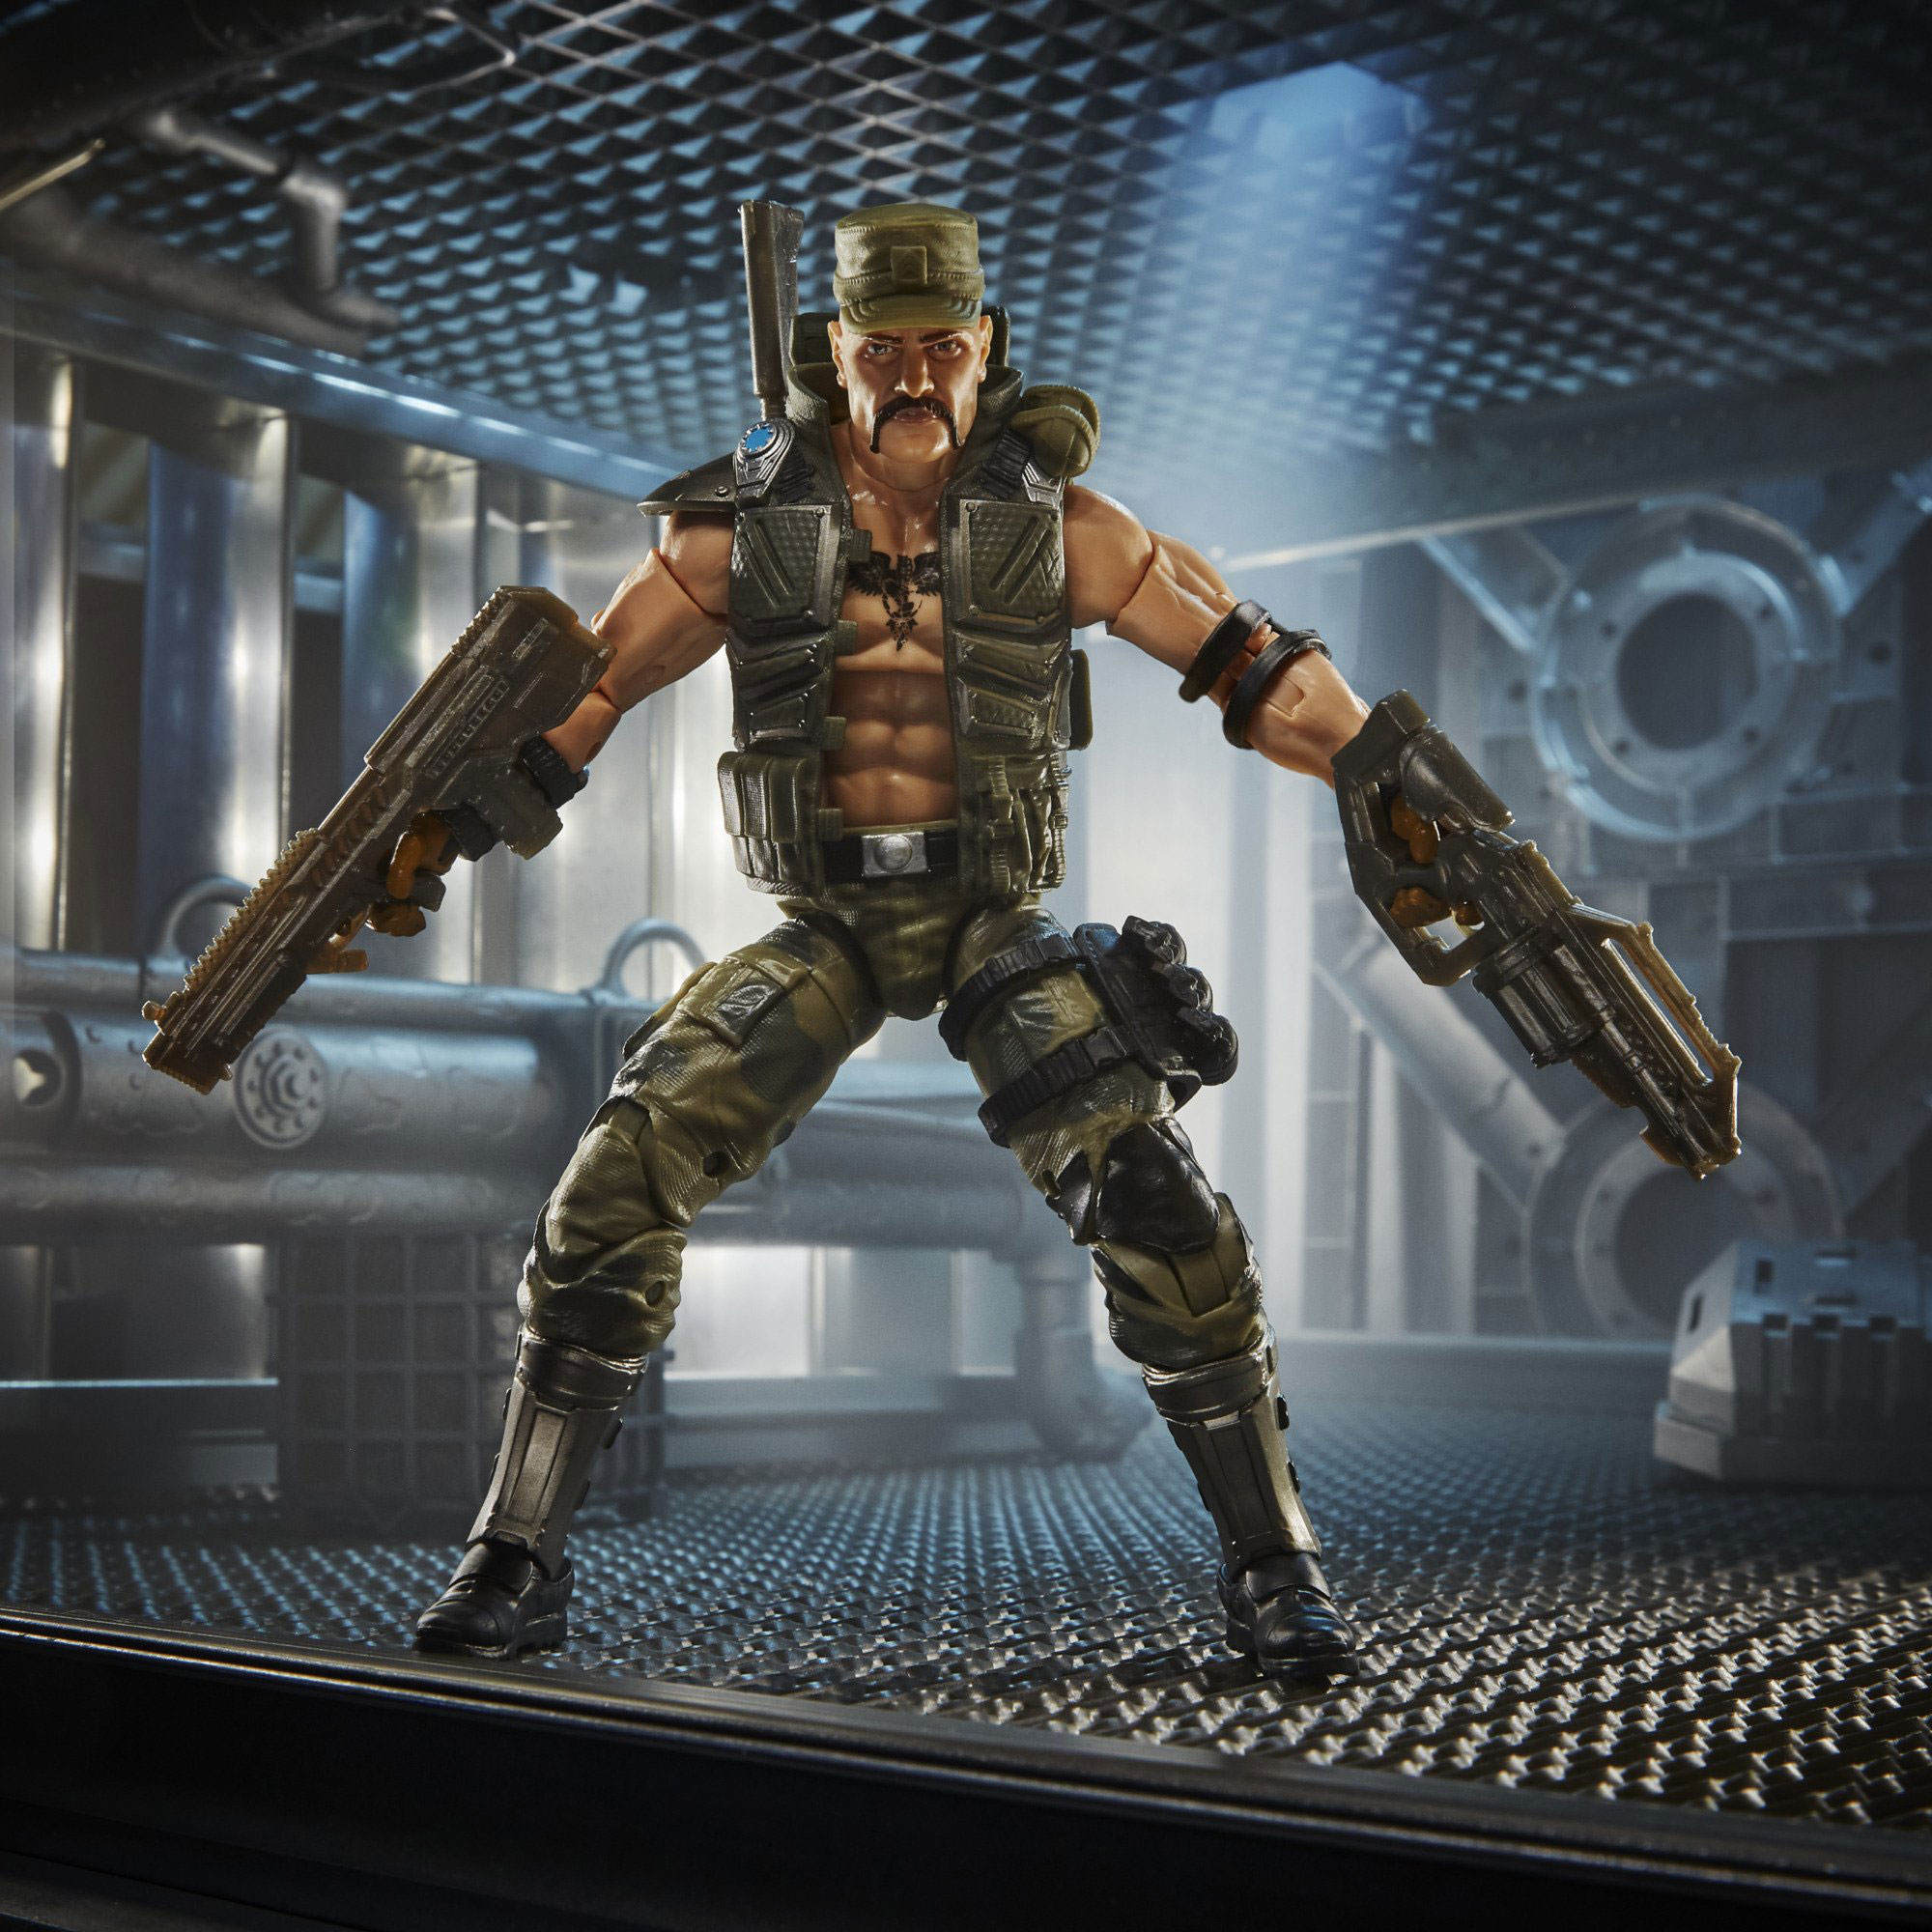 gung-ho-gi-joe-classified-series-action-figure